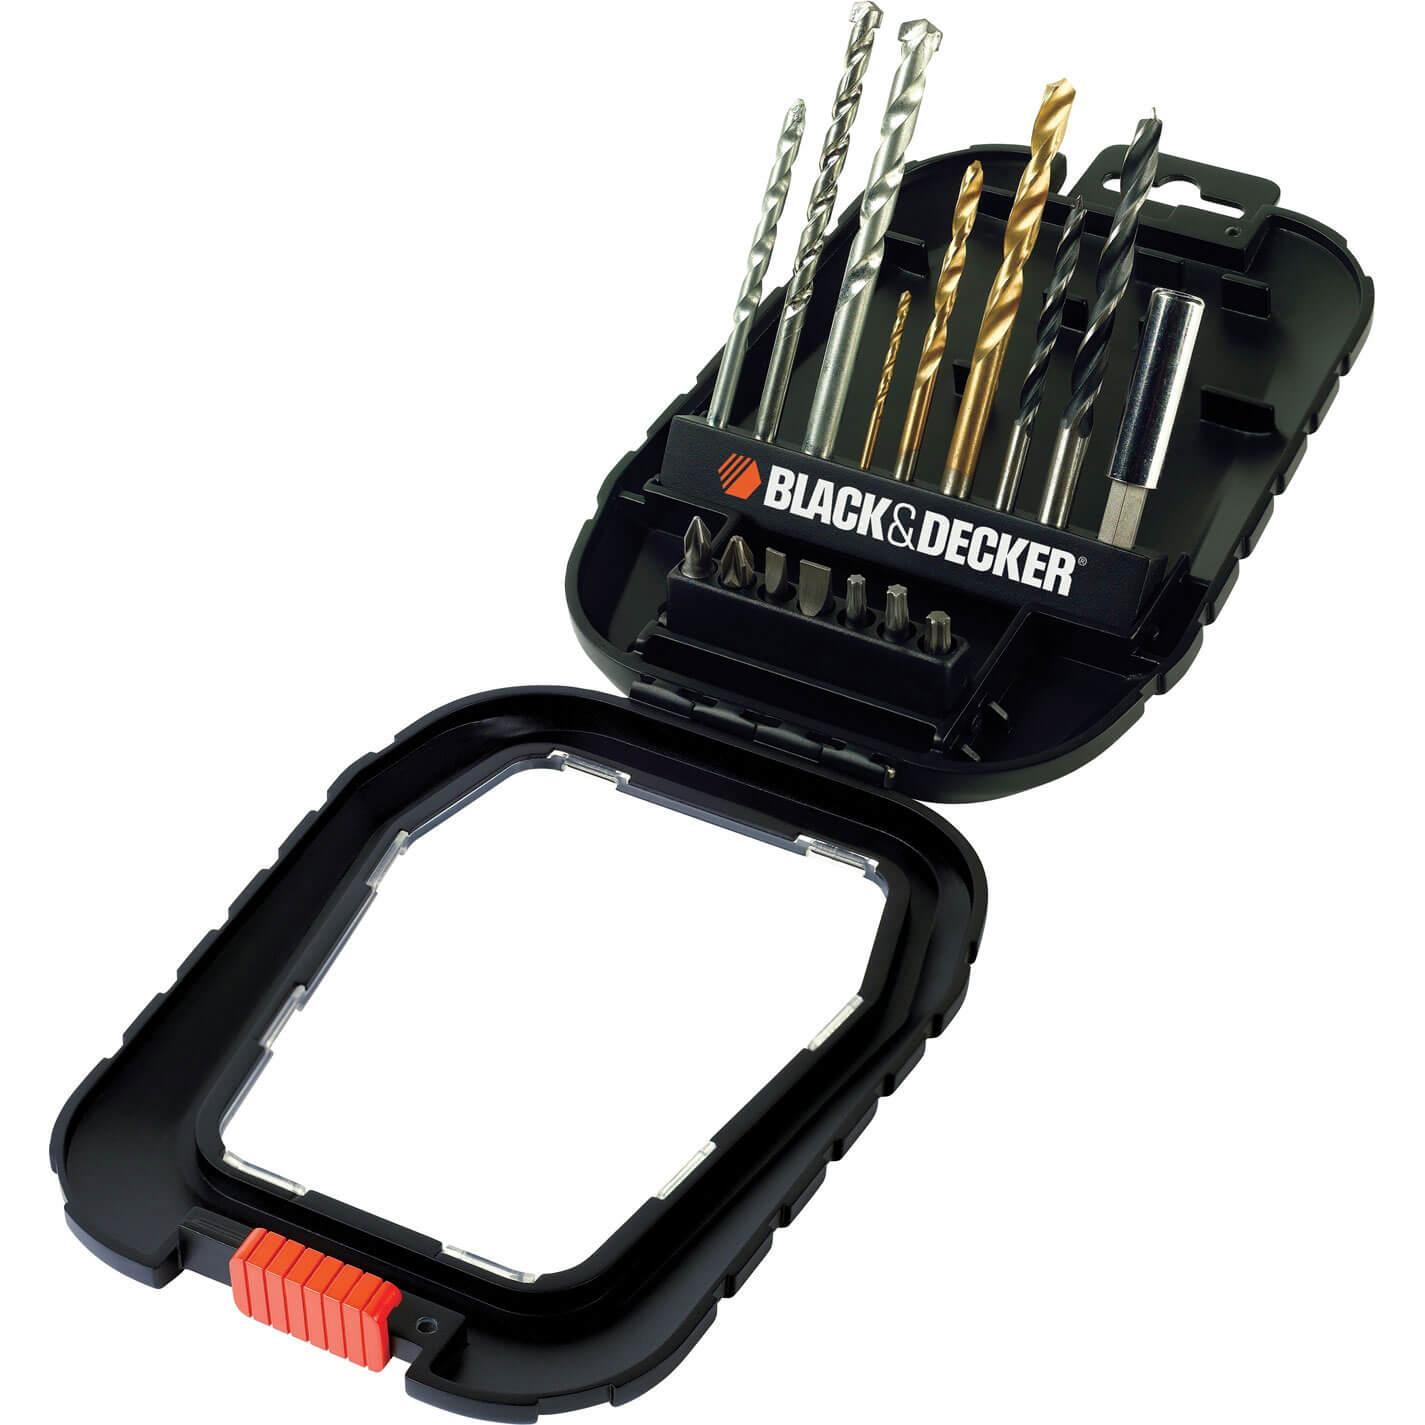 Image of Black & Decker A7186 16 Piece Drill & Screwdriver Bit Set